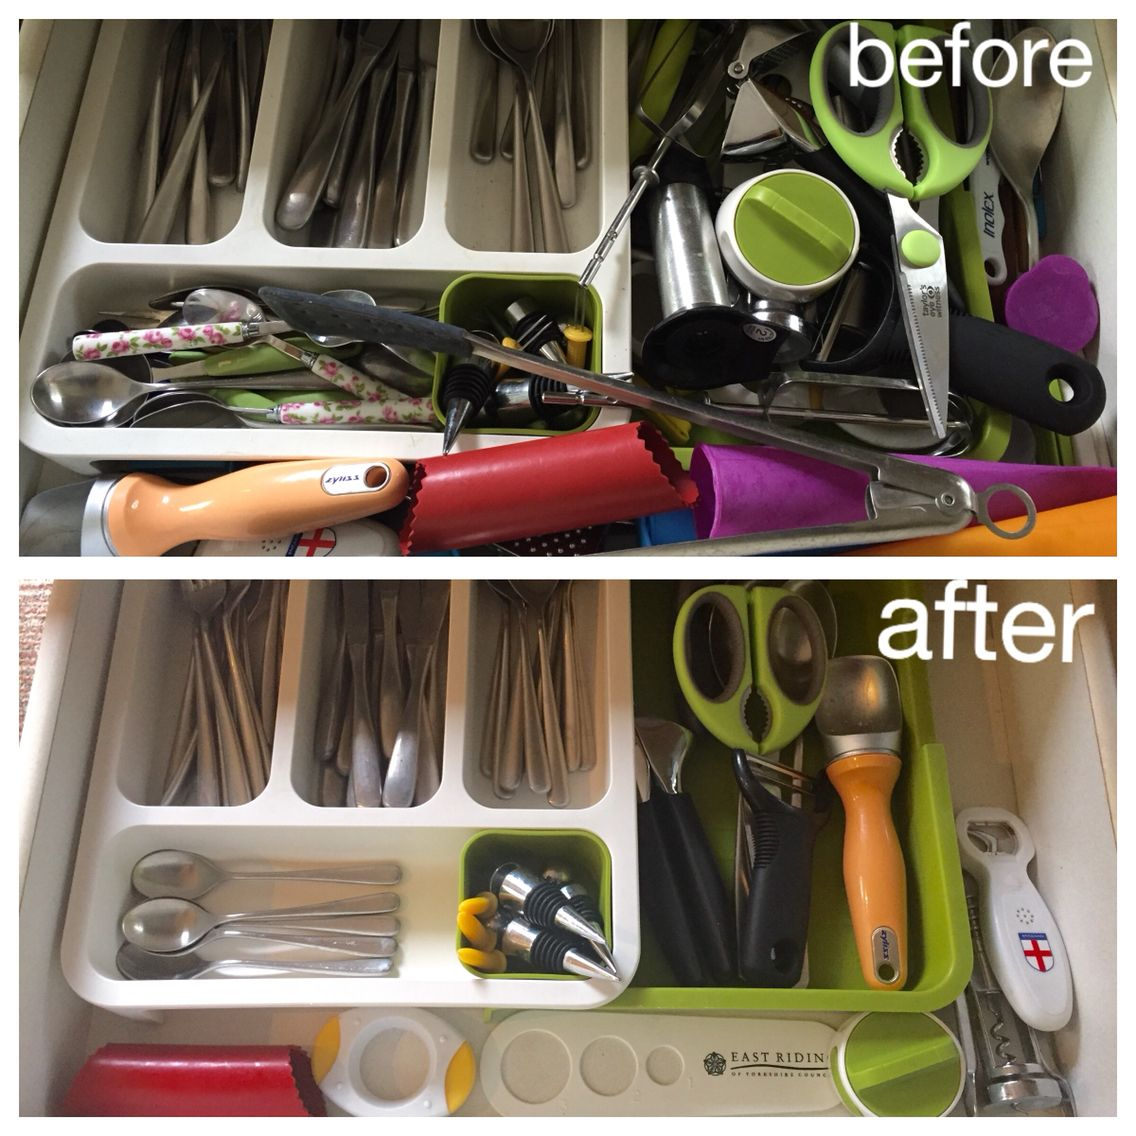 before and after kitchen kimono konmari method marie kondo organizing on kitchen organization before and after id=65358